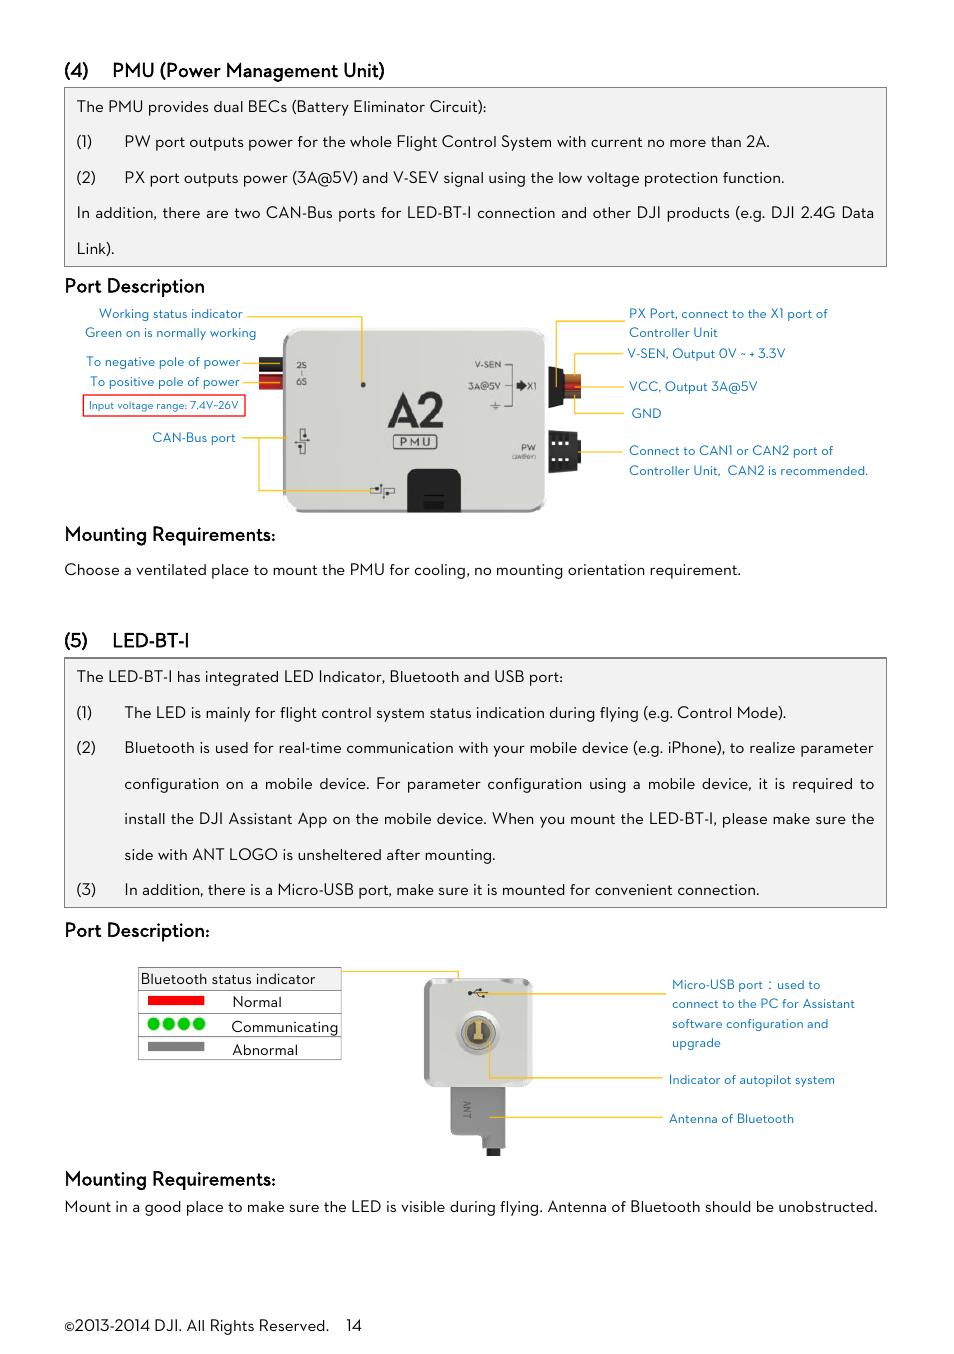 4 Pmu Power Management Unit Port Description Mounting Battery Eliminator Circuit Pictures Requirements Dji A2 User Manual Page 14 56